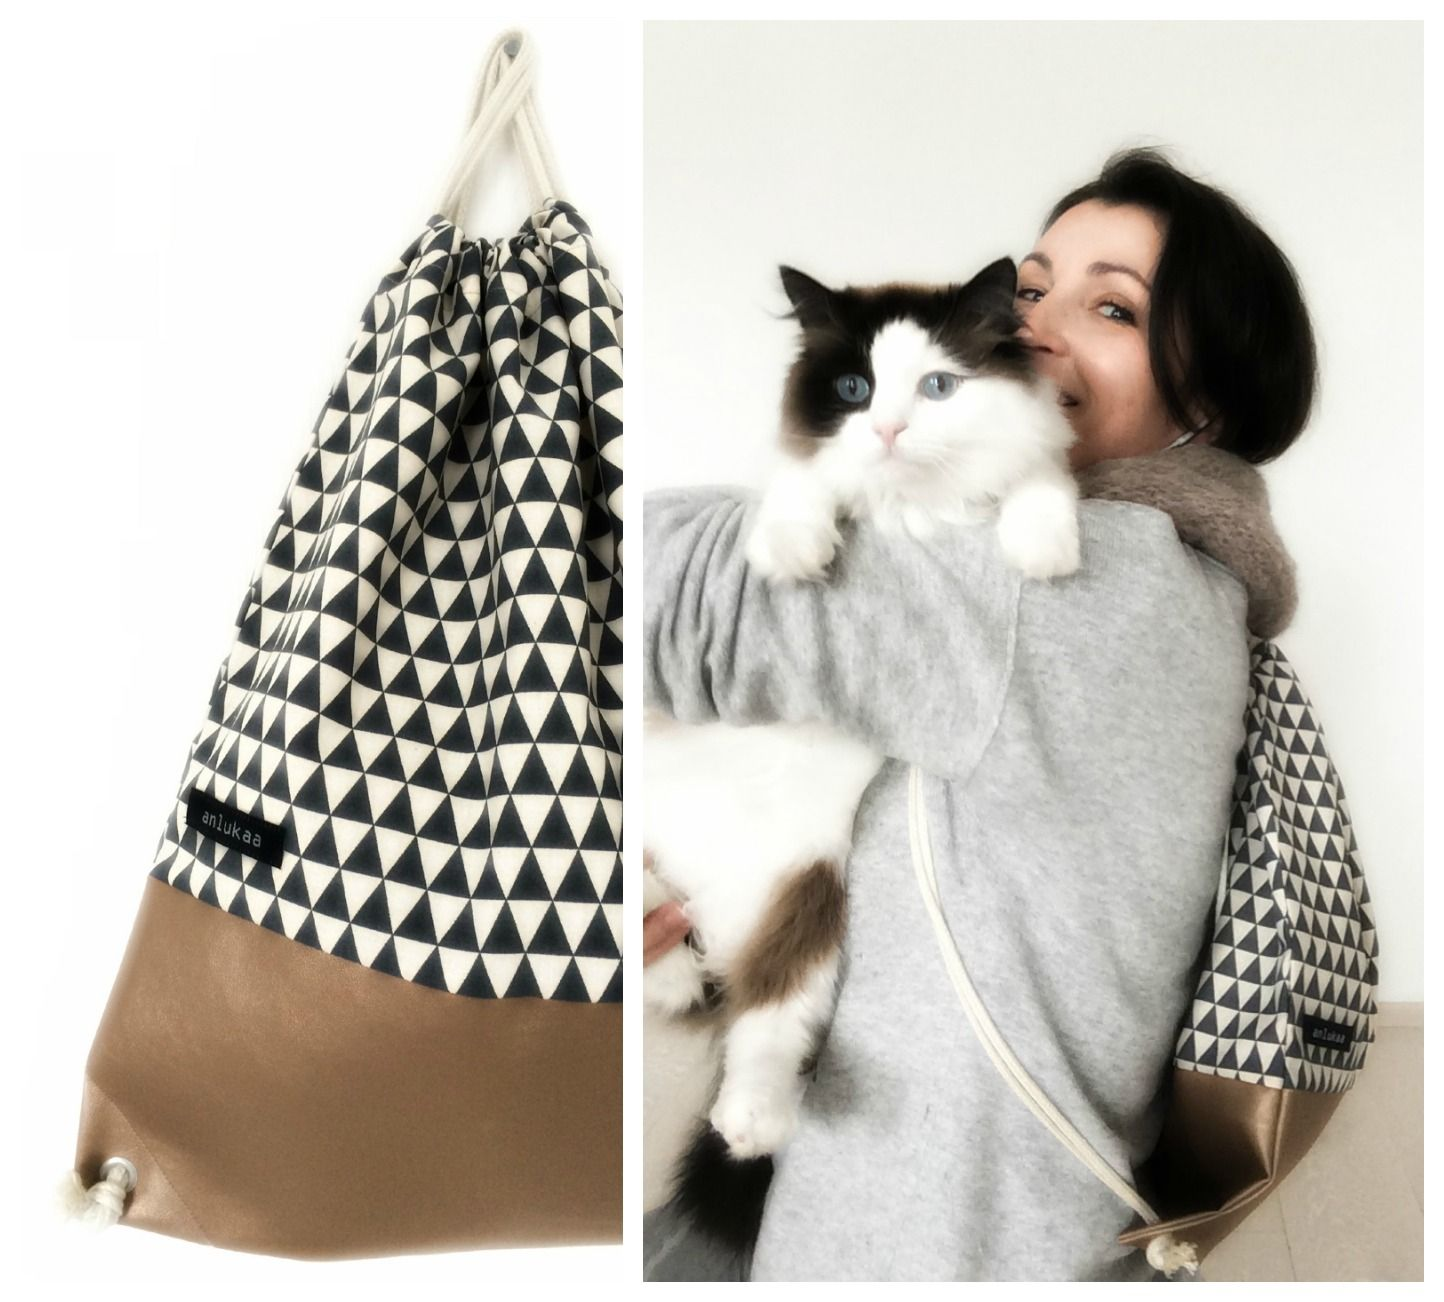 anlukaa glas faden turnbeutel rucksack der 2 handarbeiten pinterest rucksack. Black Bedroom Furniture Sets. Home Design Ideas